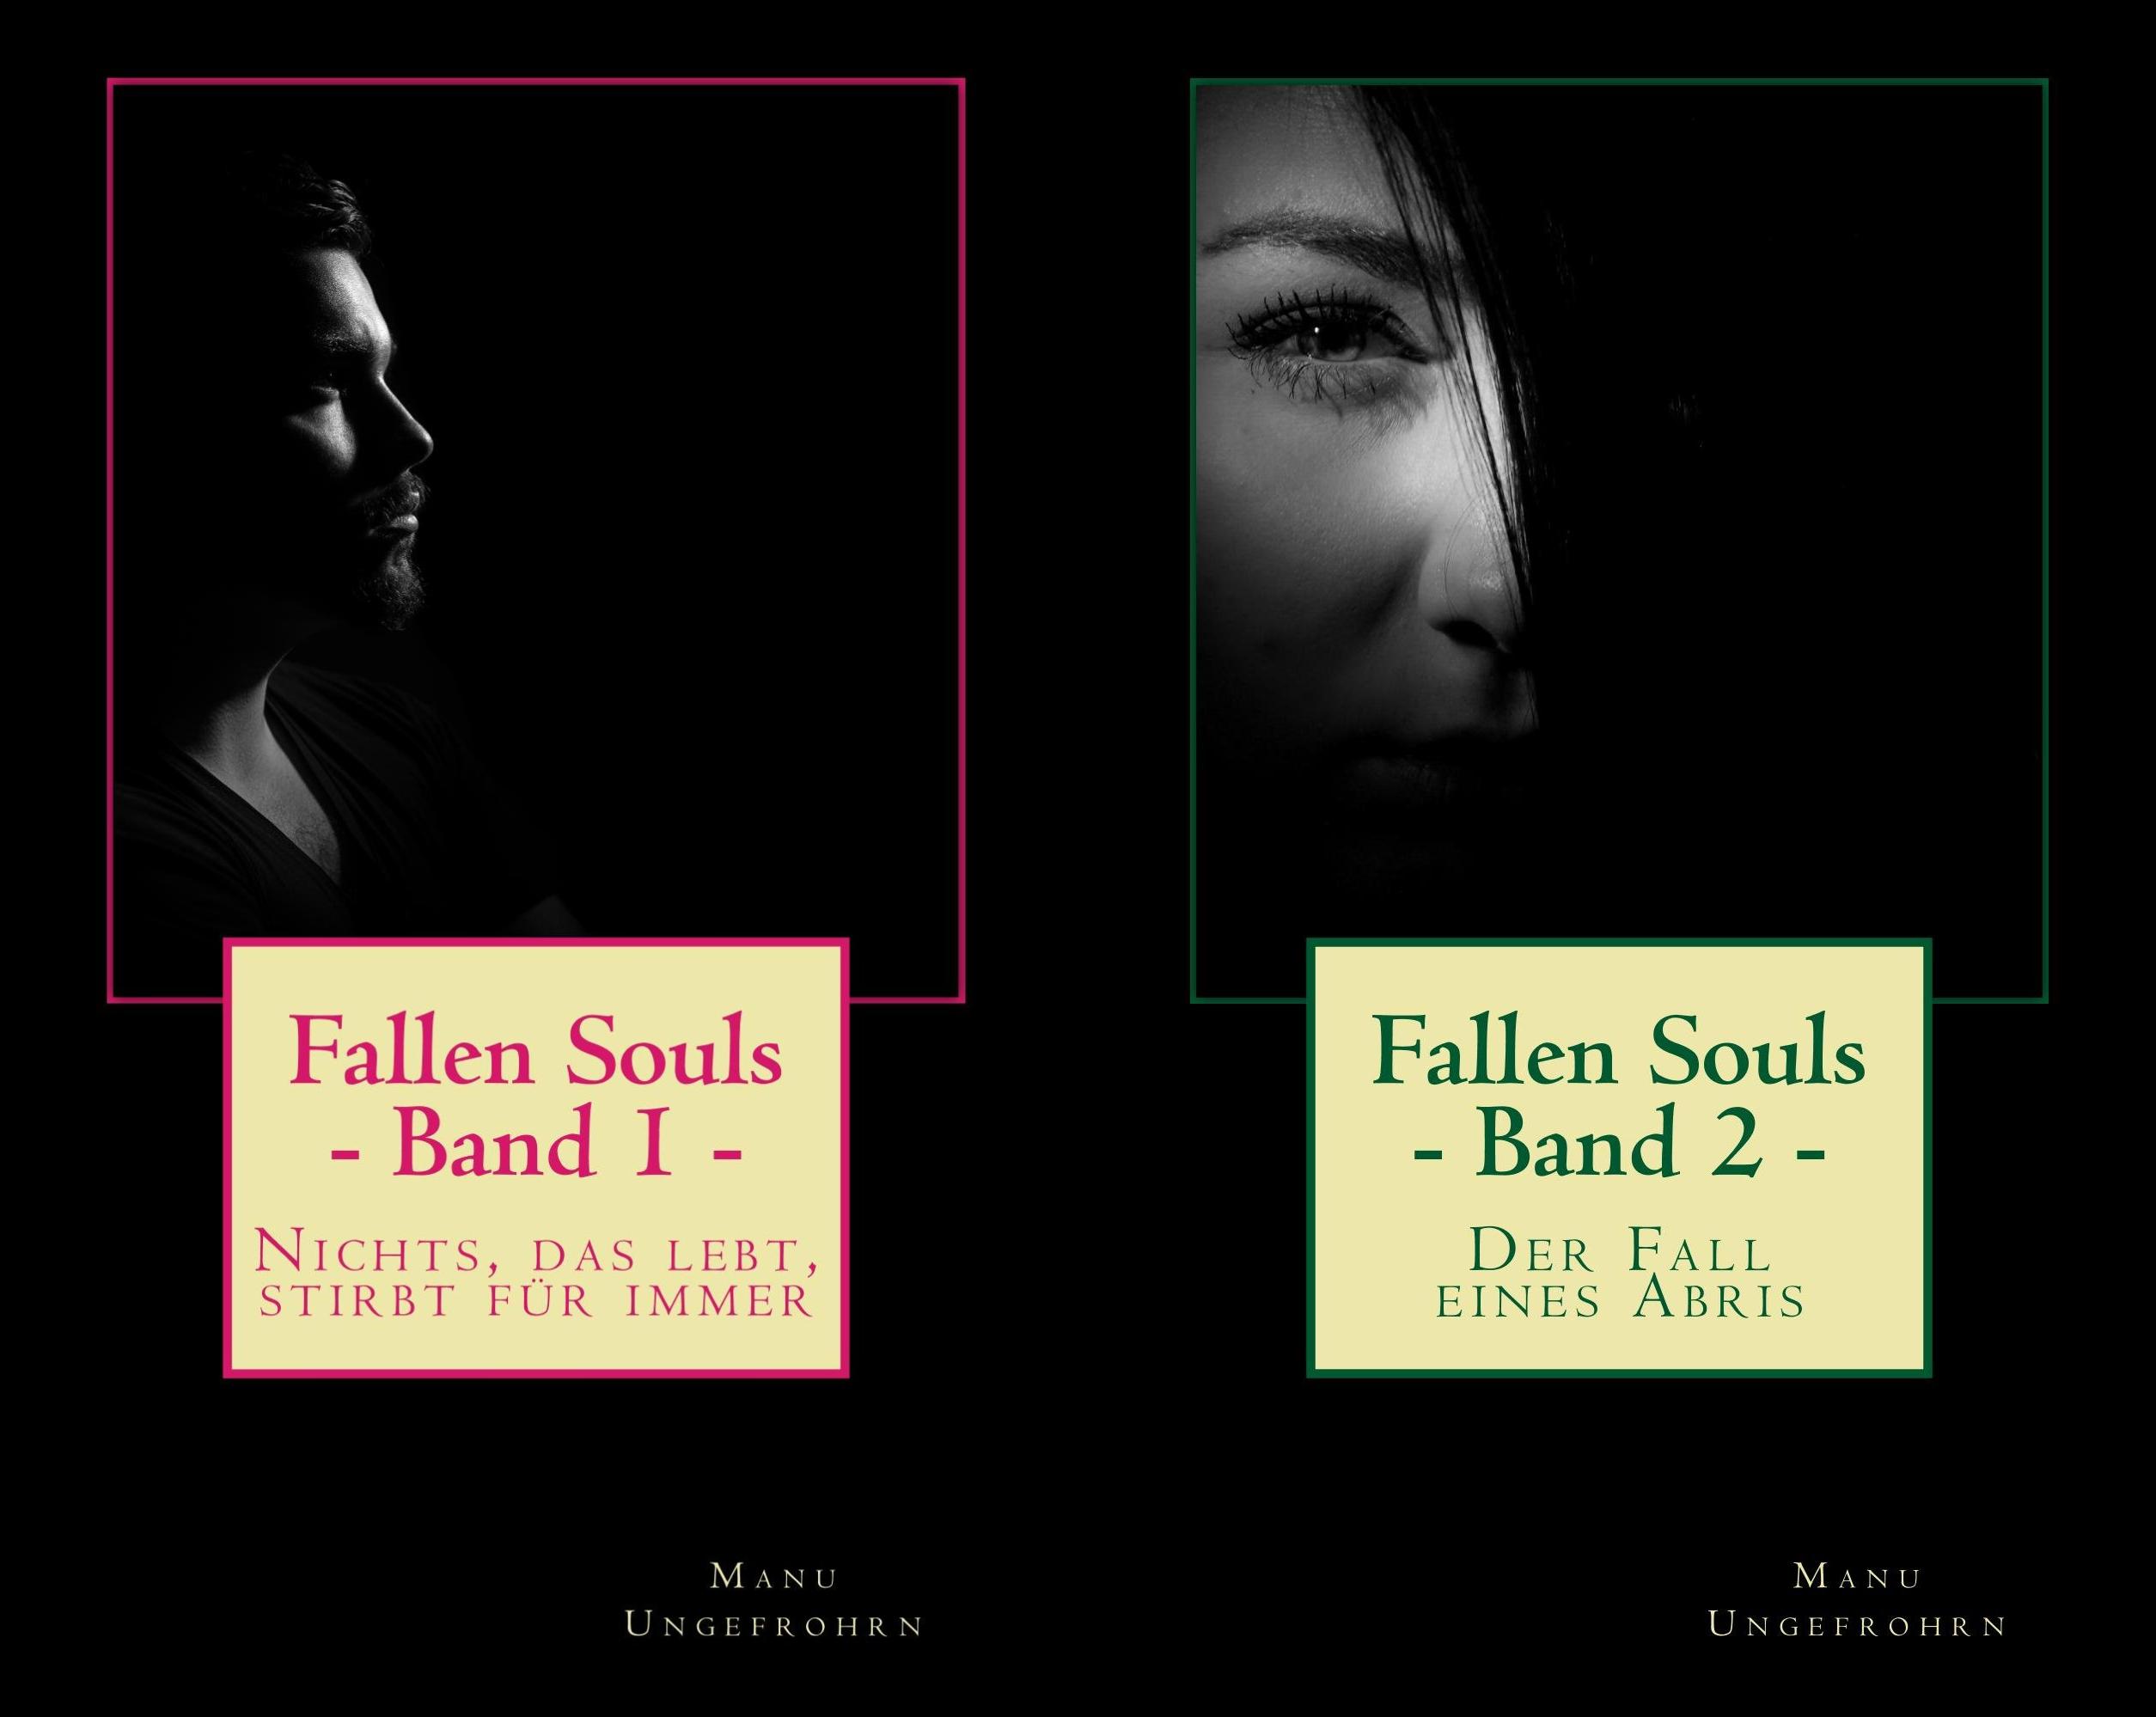 Fallen Souls (Reihe in 2 Bänden)